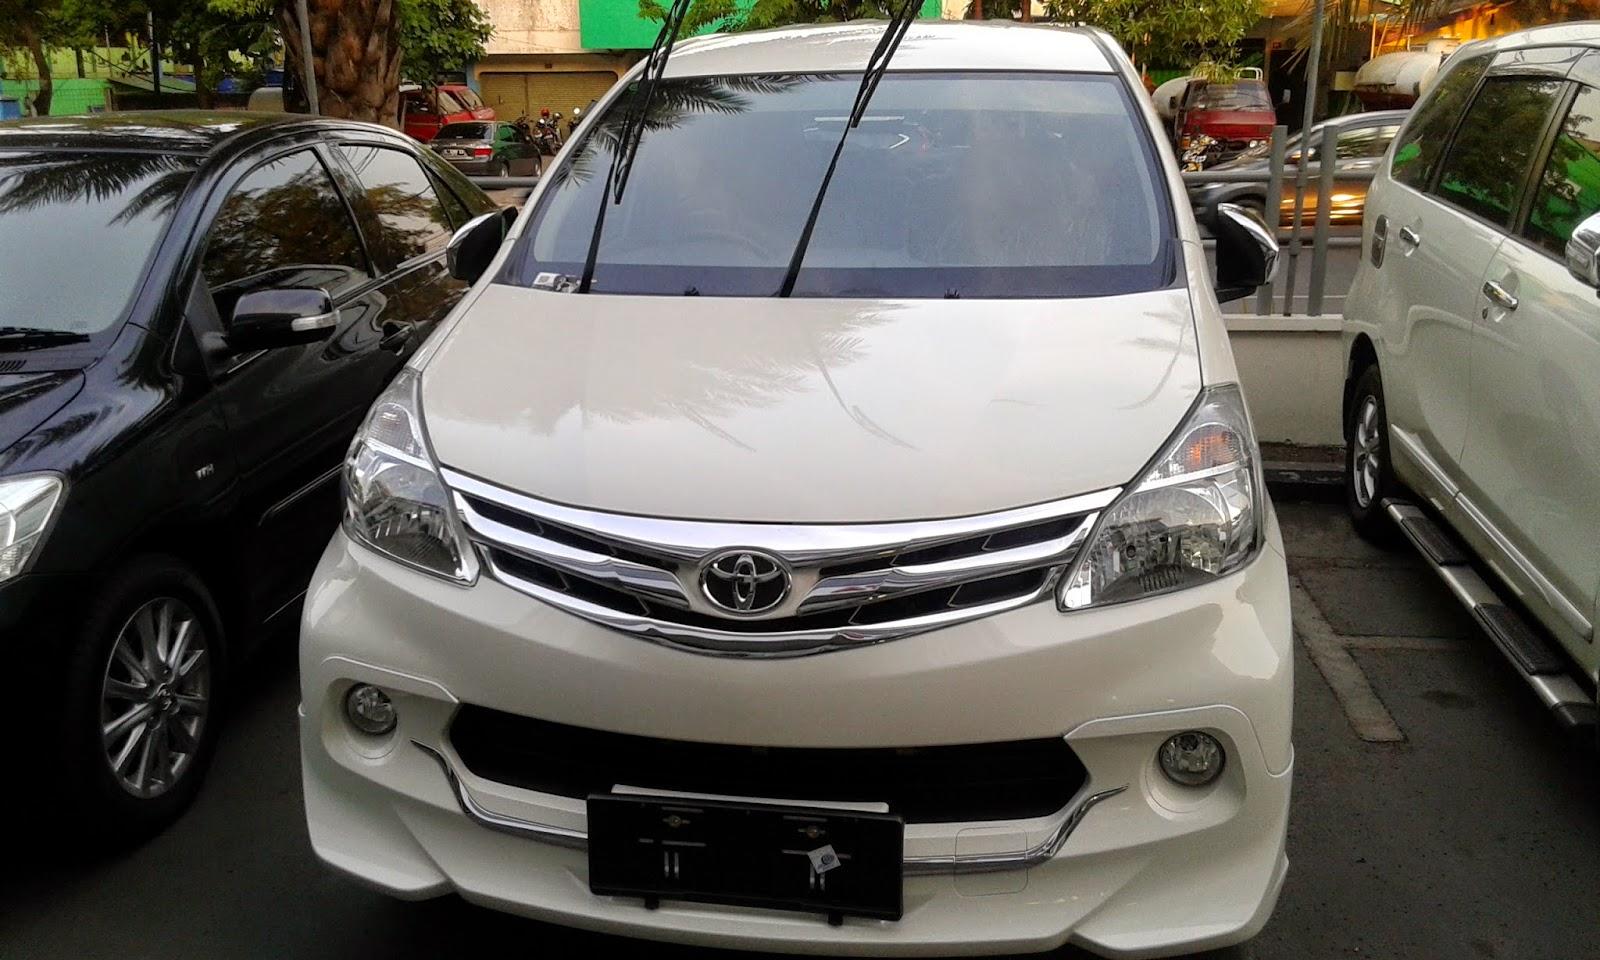 harga avanza baru 2015 Harga Baru Toyota Avanza Bulan 05 Januari 2015